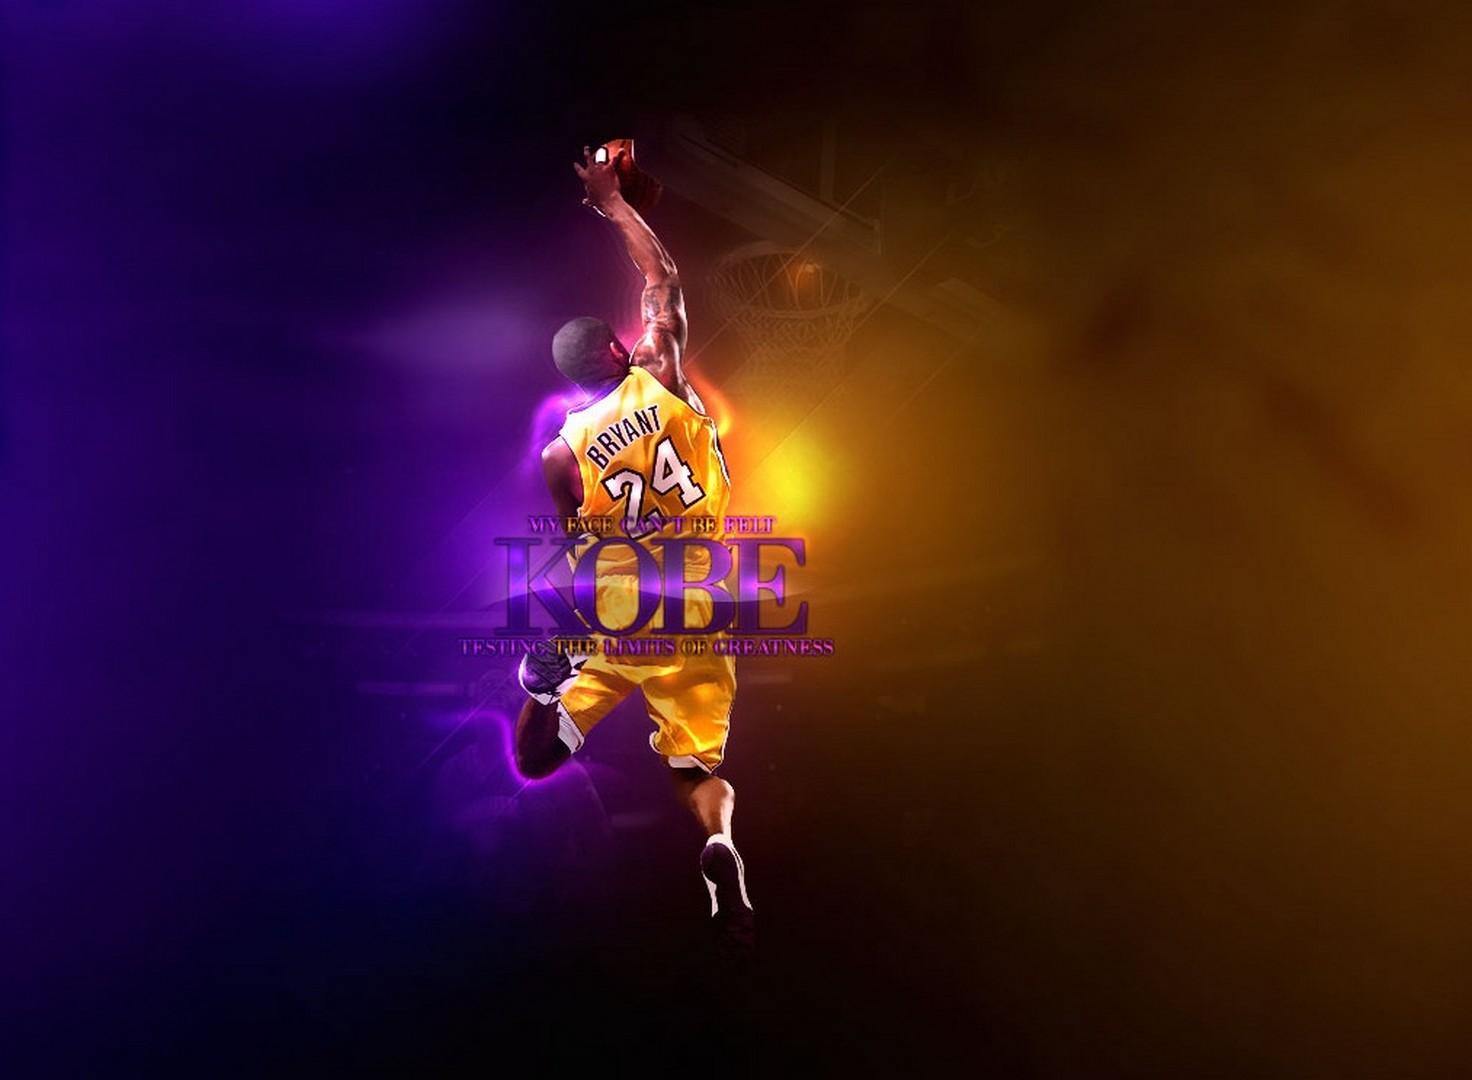 Kobe Bryant Dunk NBA Wallpaper Big Fan of NBA   Daily Update 1472x1080